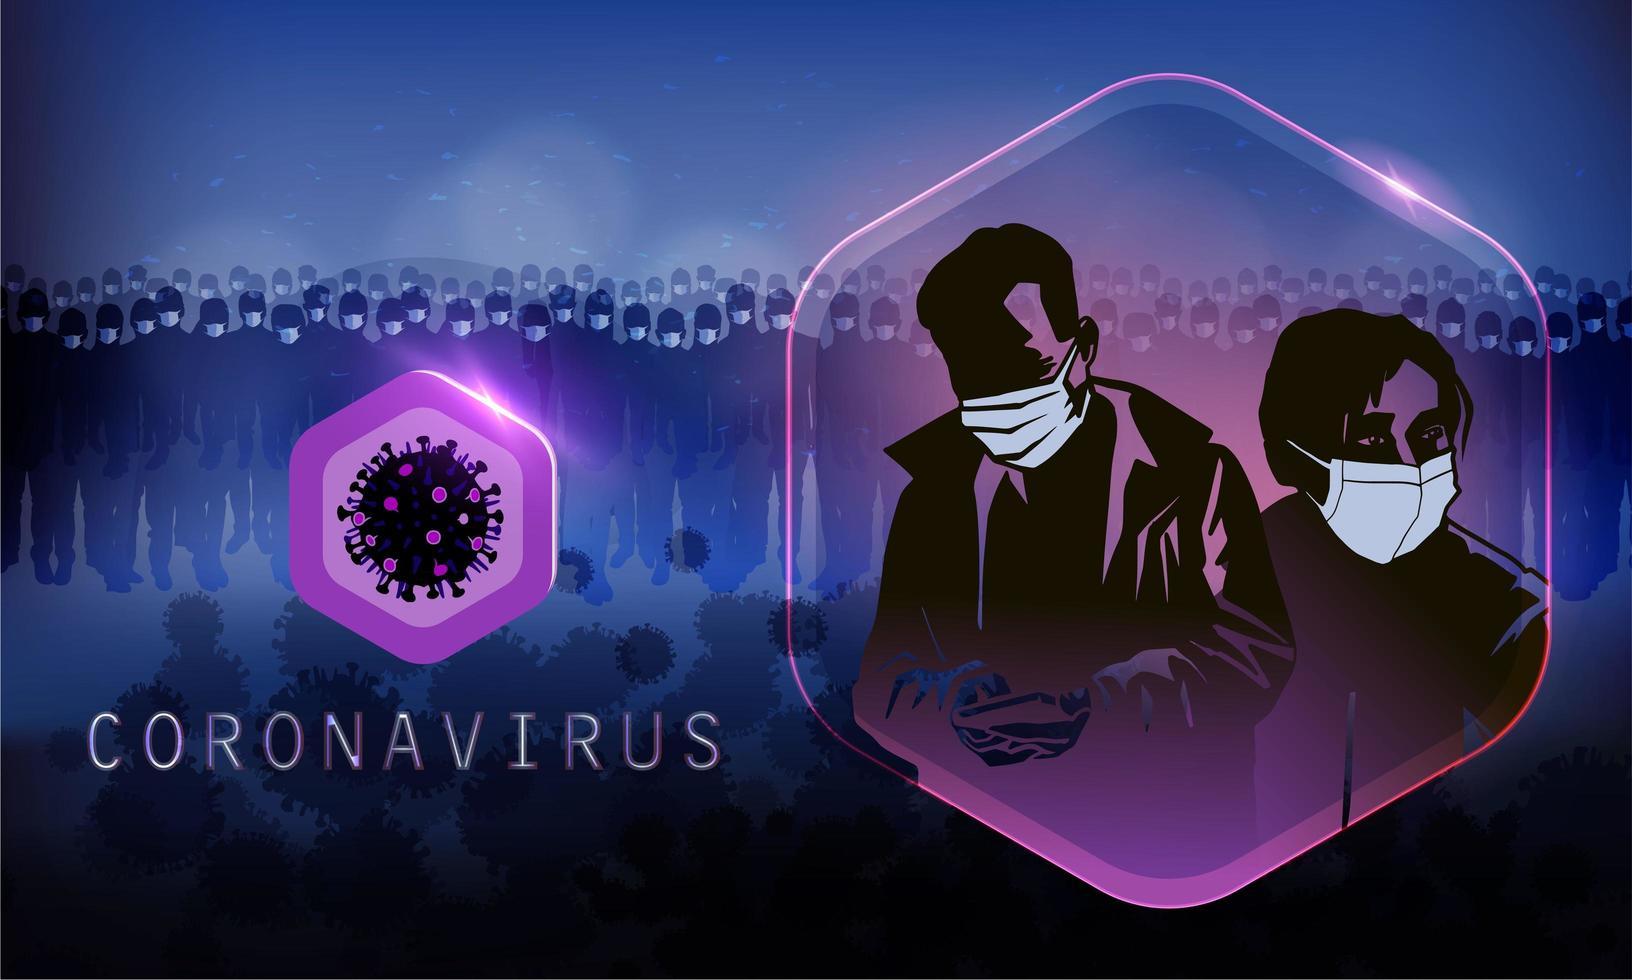 poster di coronavirus scuro vettore